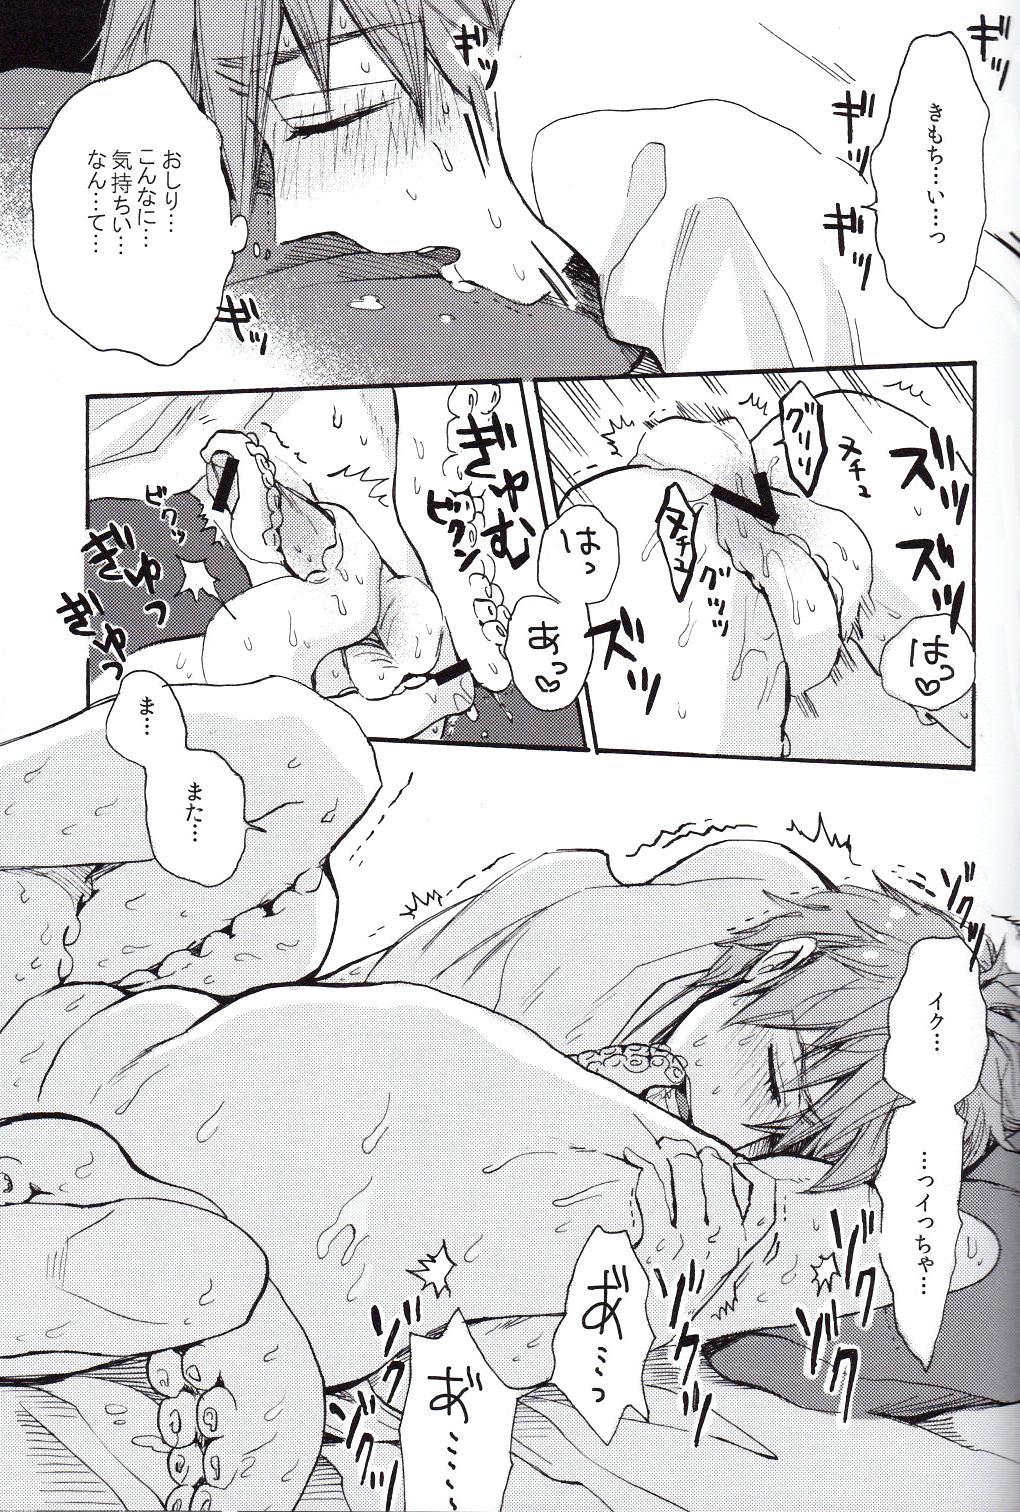 [hn (pirori)] Mako-chan jana-Ika!? (Free!) 13